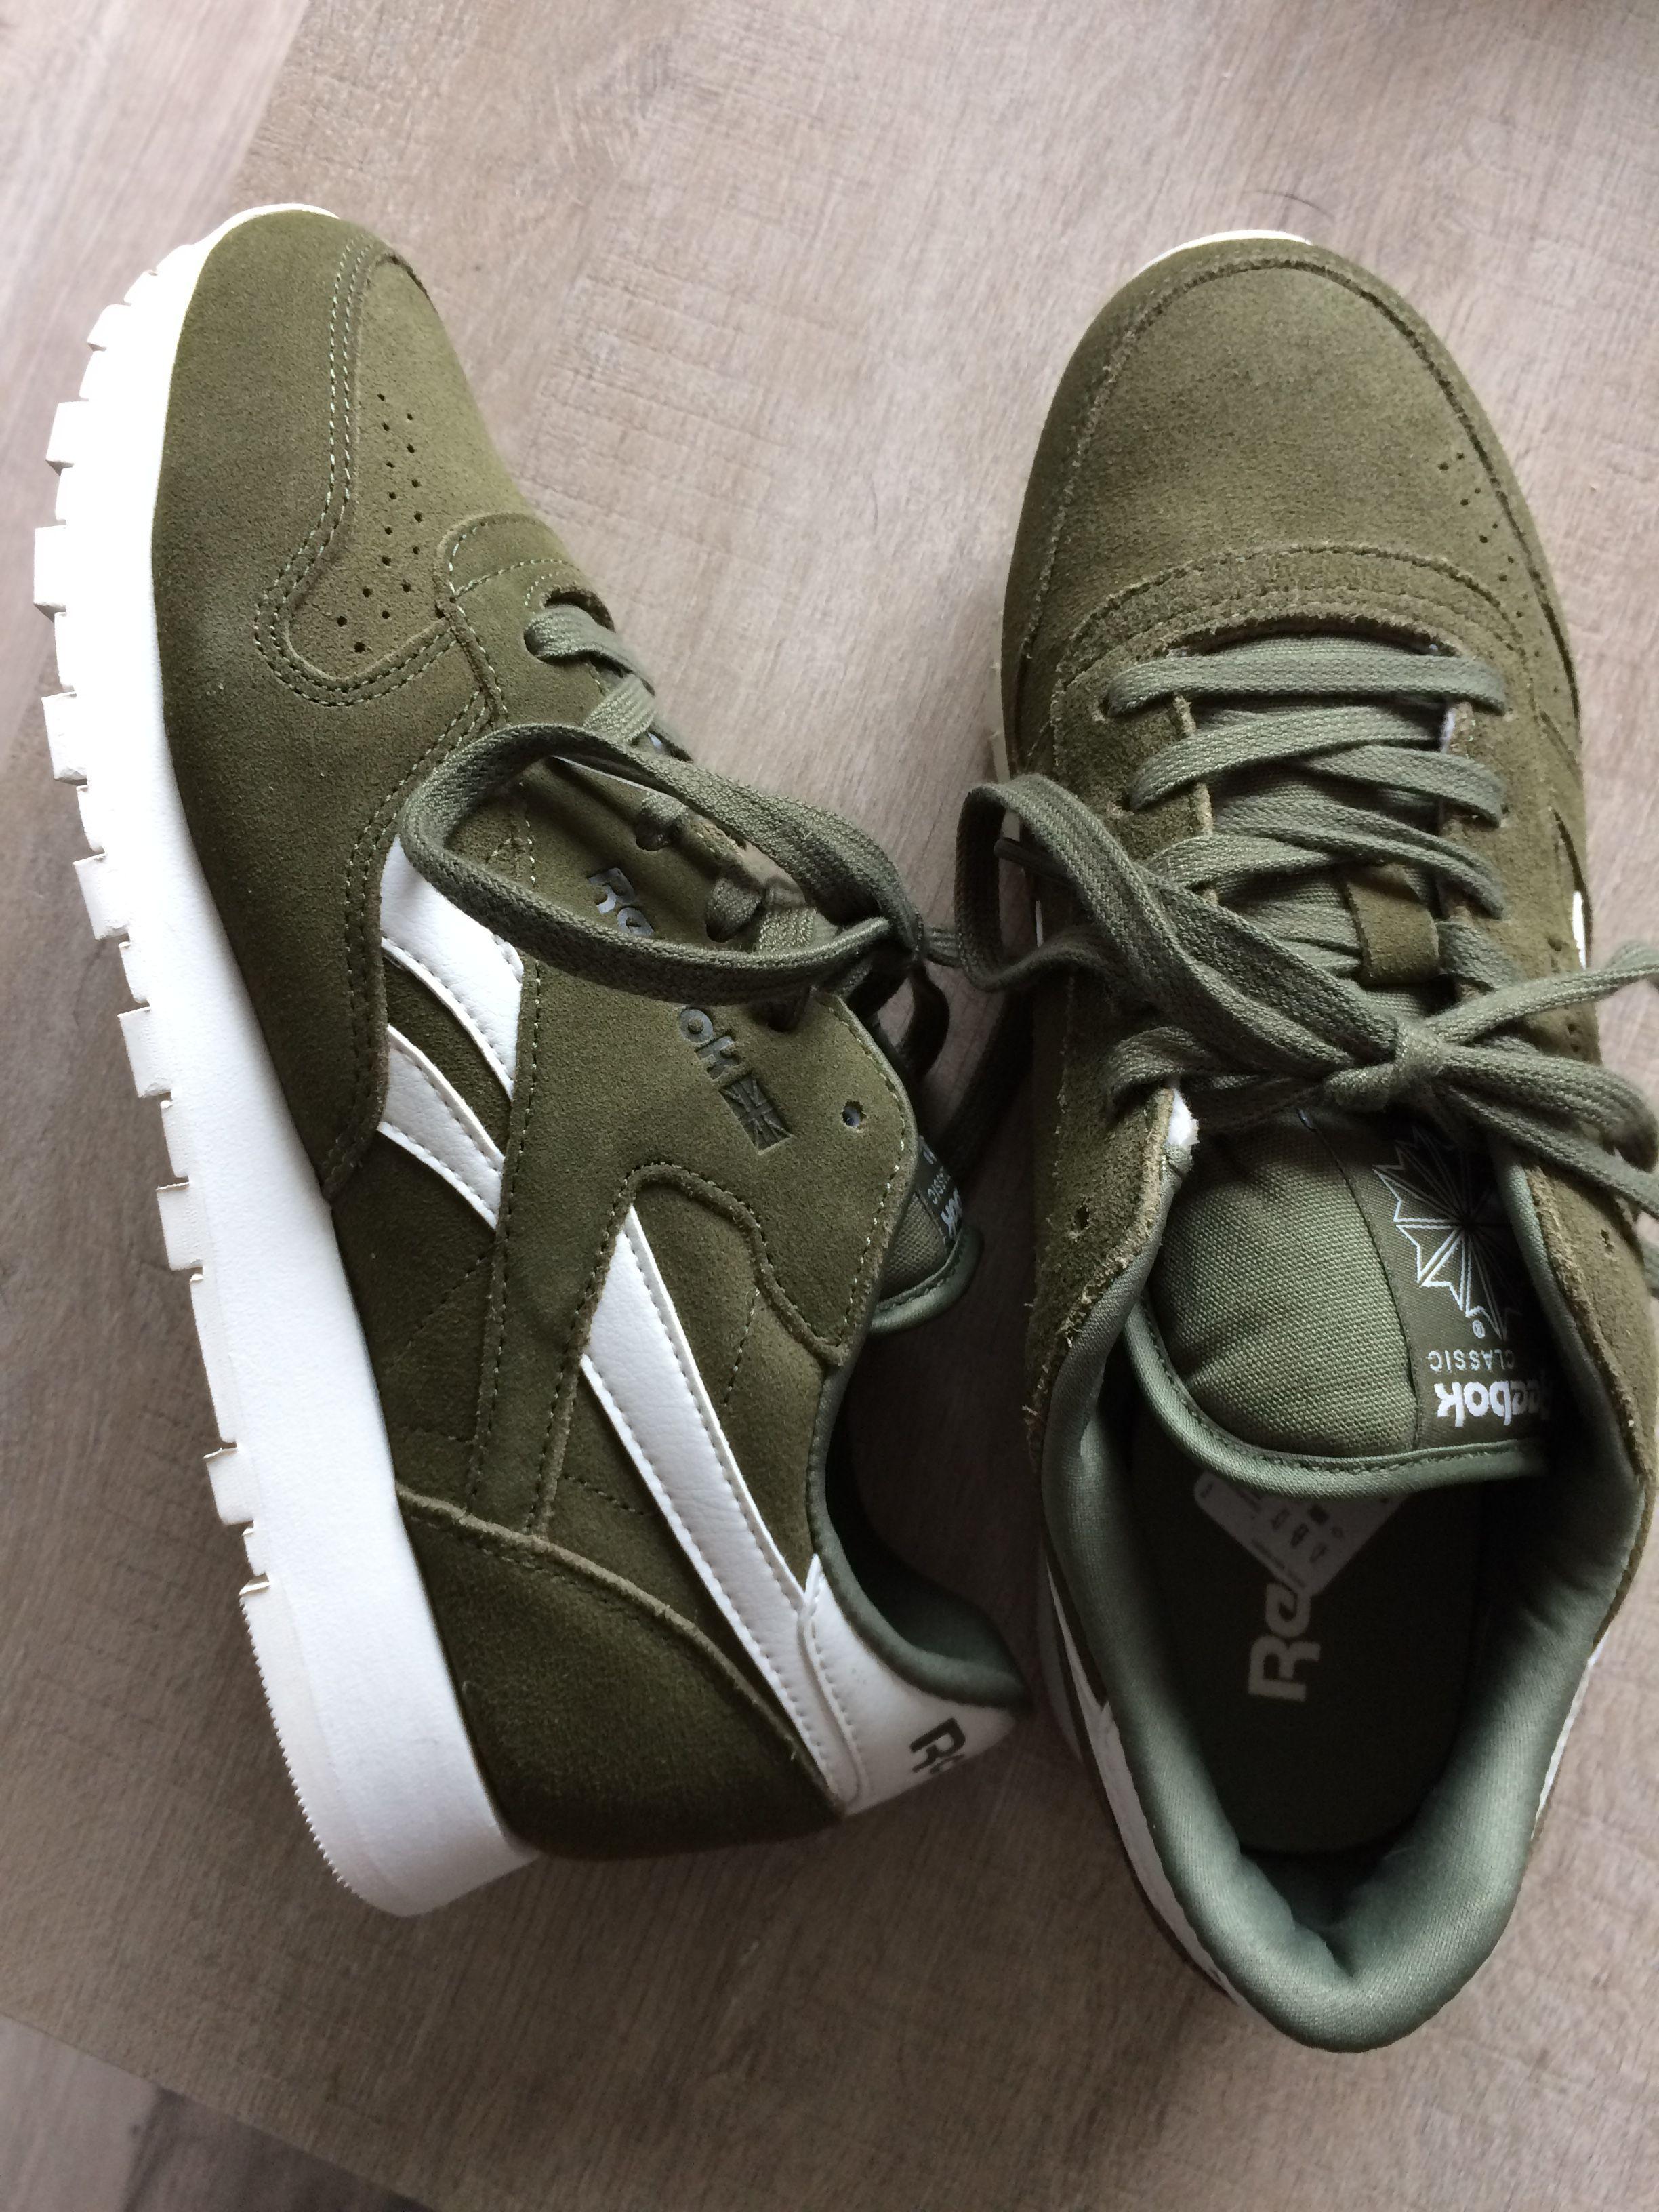 b6de44b8e2a3f Reebok Classic kaki   sneakers